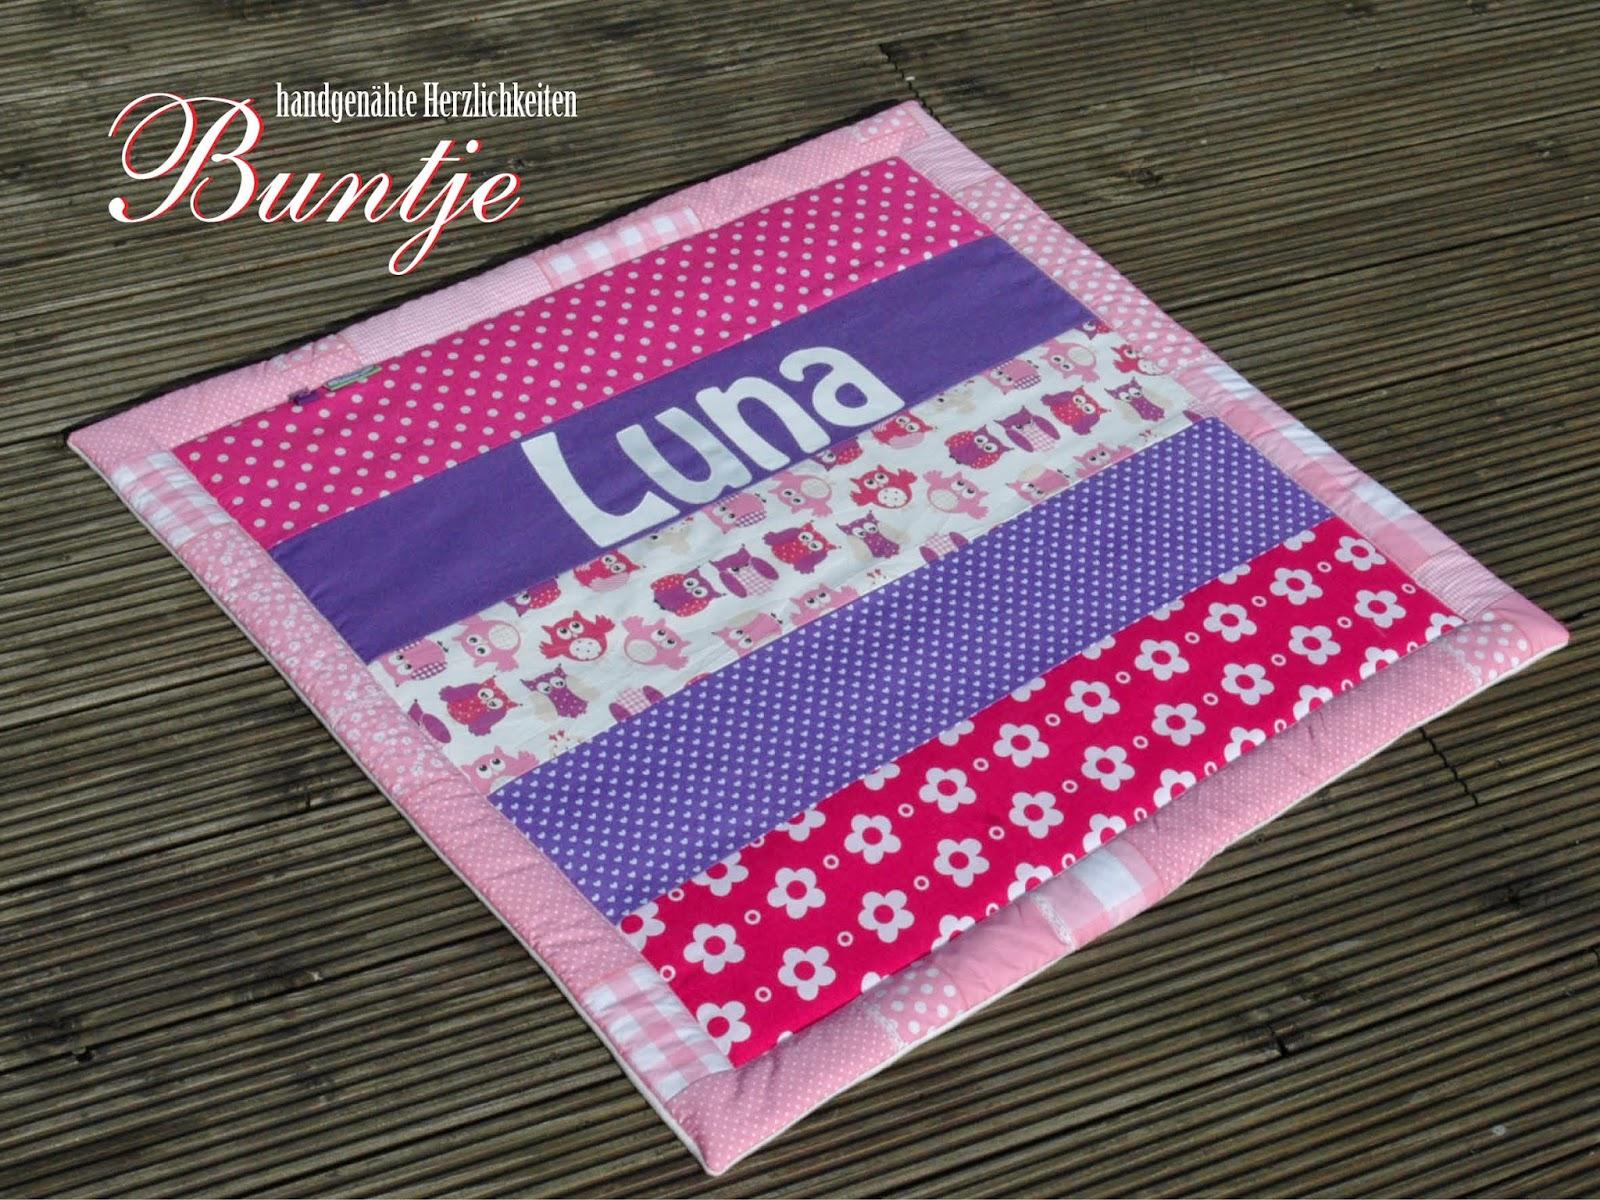 Krabbeldecke Kuscheldecke Decke Baby Name Geschenk Geburt Taufe Mädchen Eulen rosa pink lila lieder Luna Fleece Baumwolle Buntje nähen